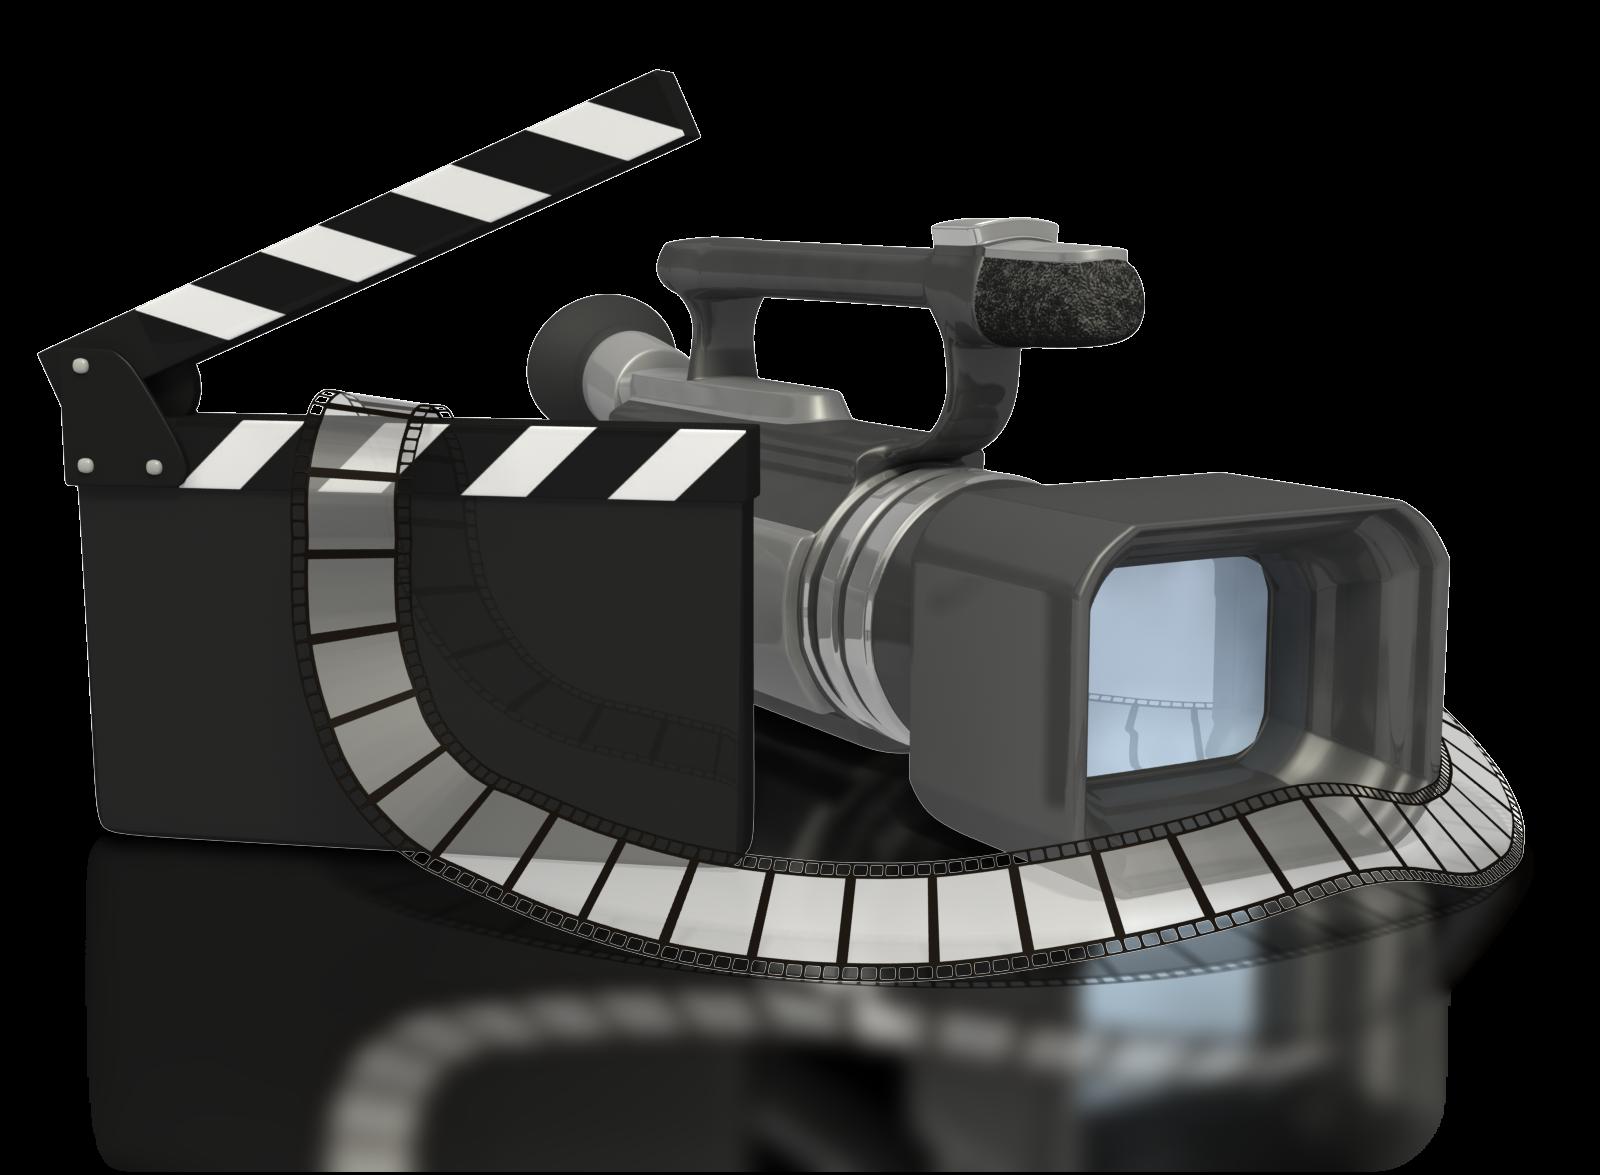 Download Video Camera Free PNG Image.